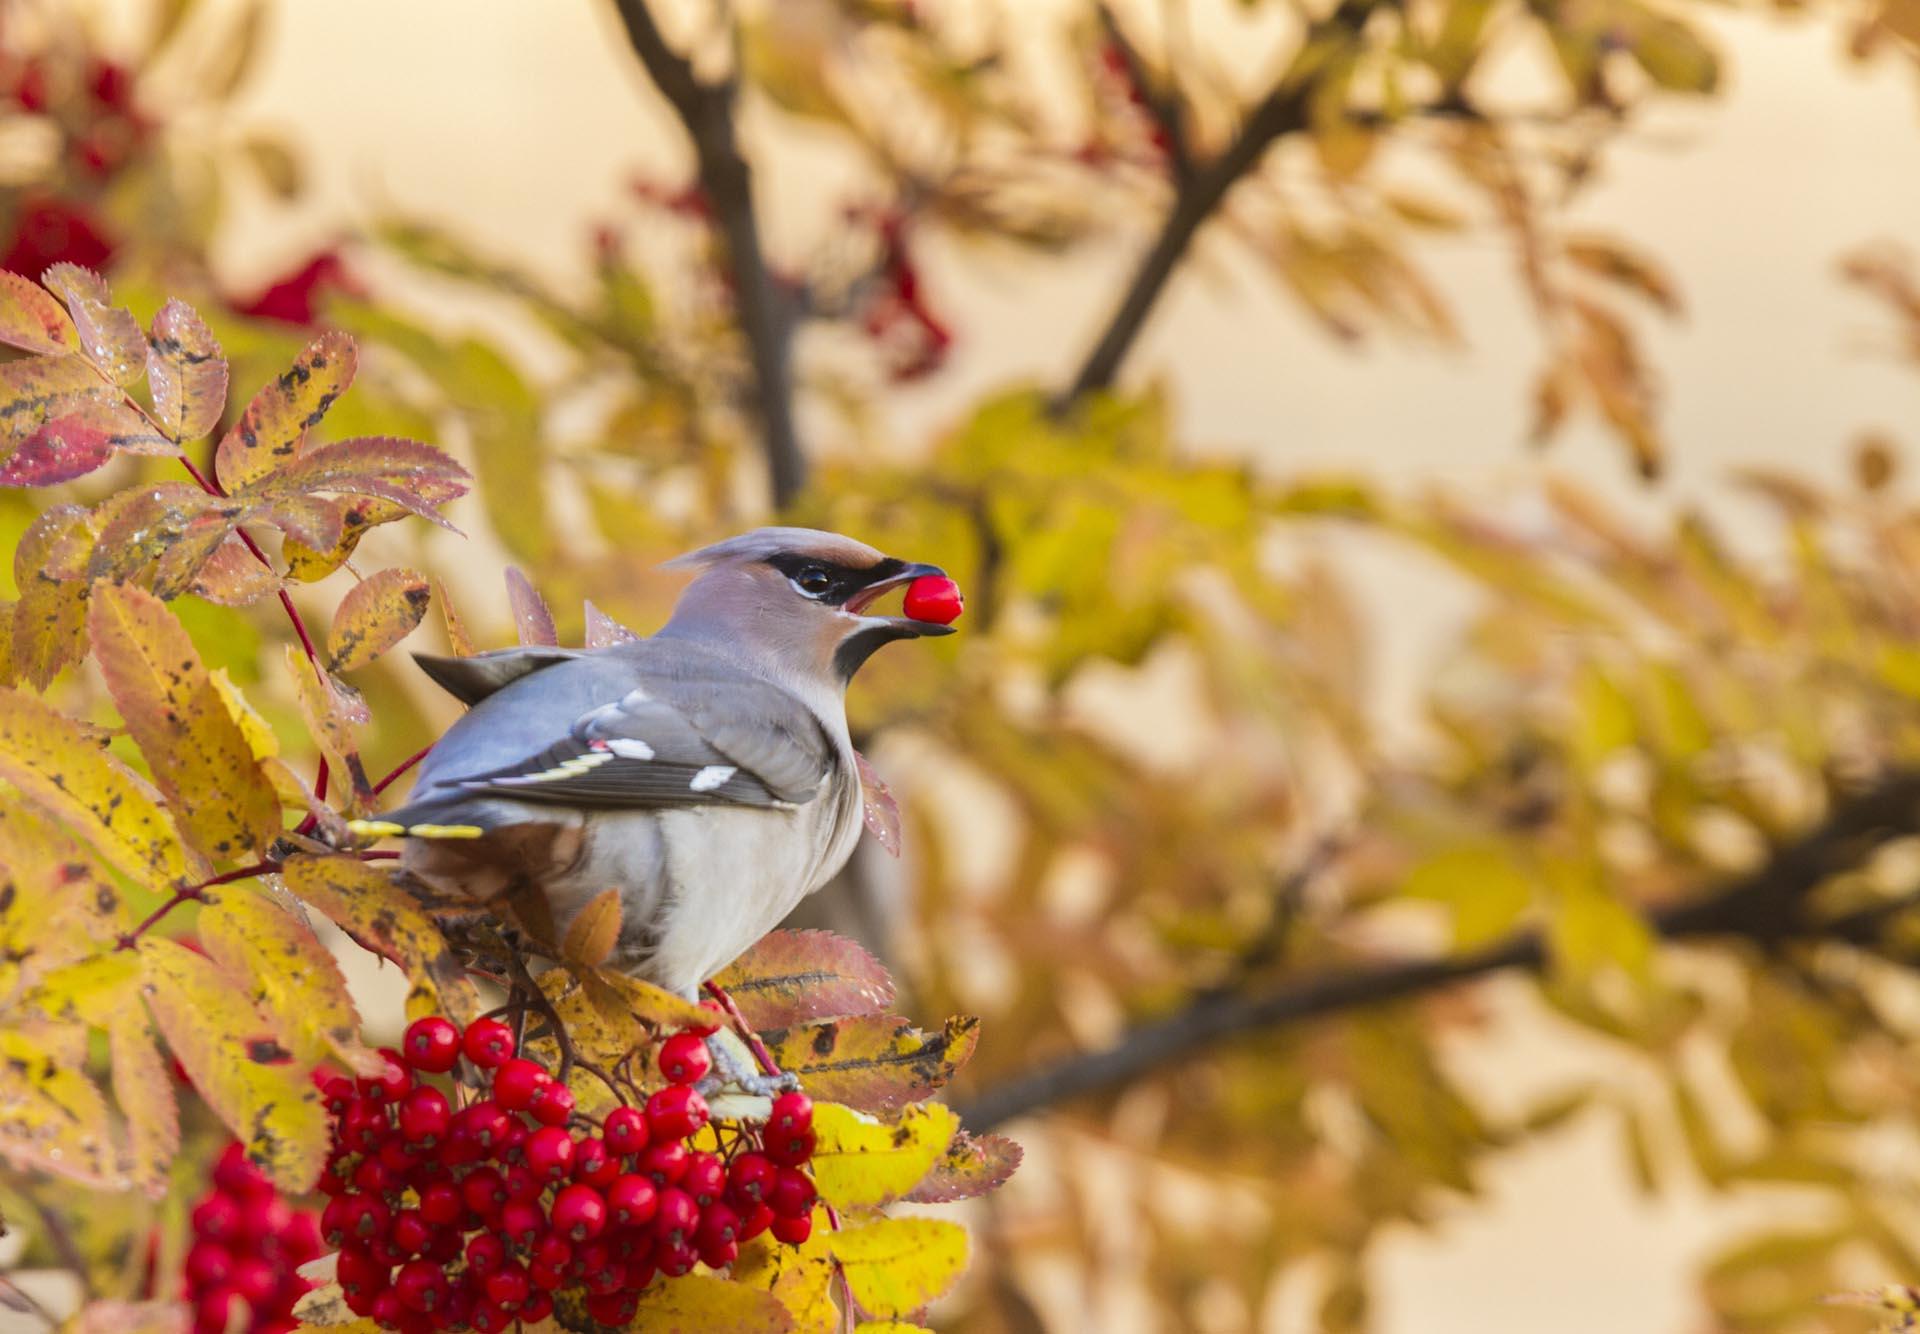 Waxwing sitting in a rowan tree eating rowan berries, having a rowan berry in his beak, Gällivare, Swedish Lapland, Sweden.